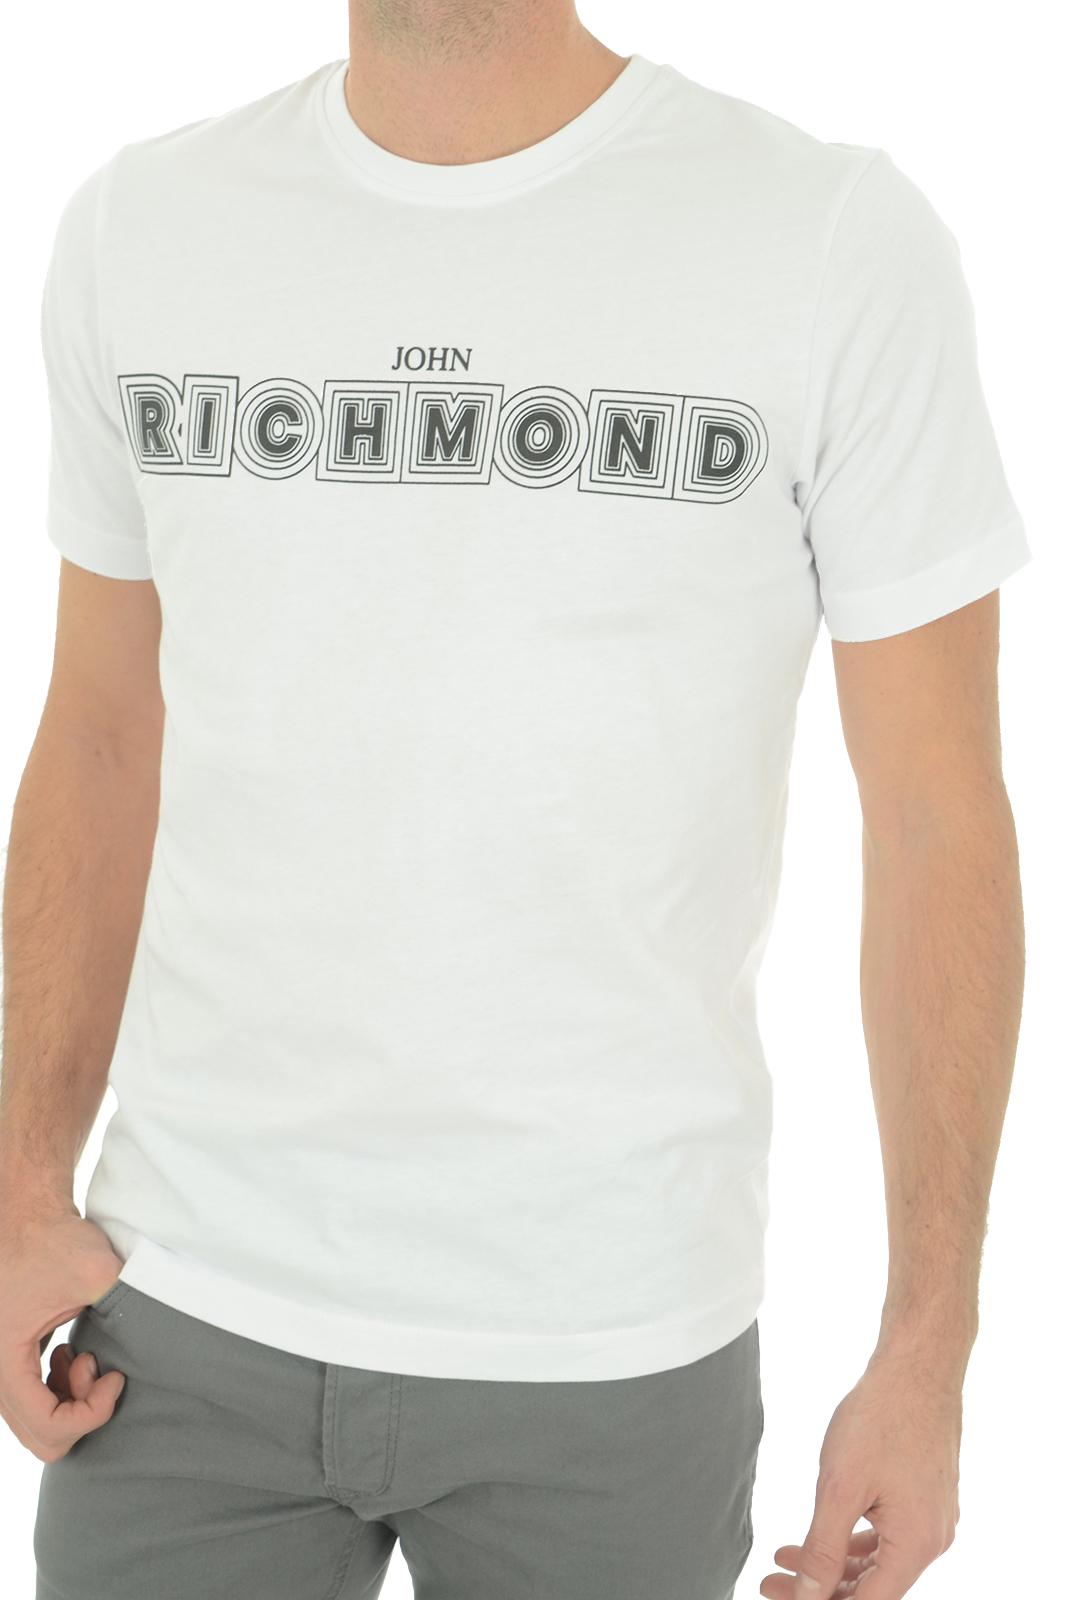 Tee-shirts  John richmond SILVANIA W0019 BLANC